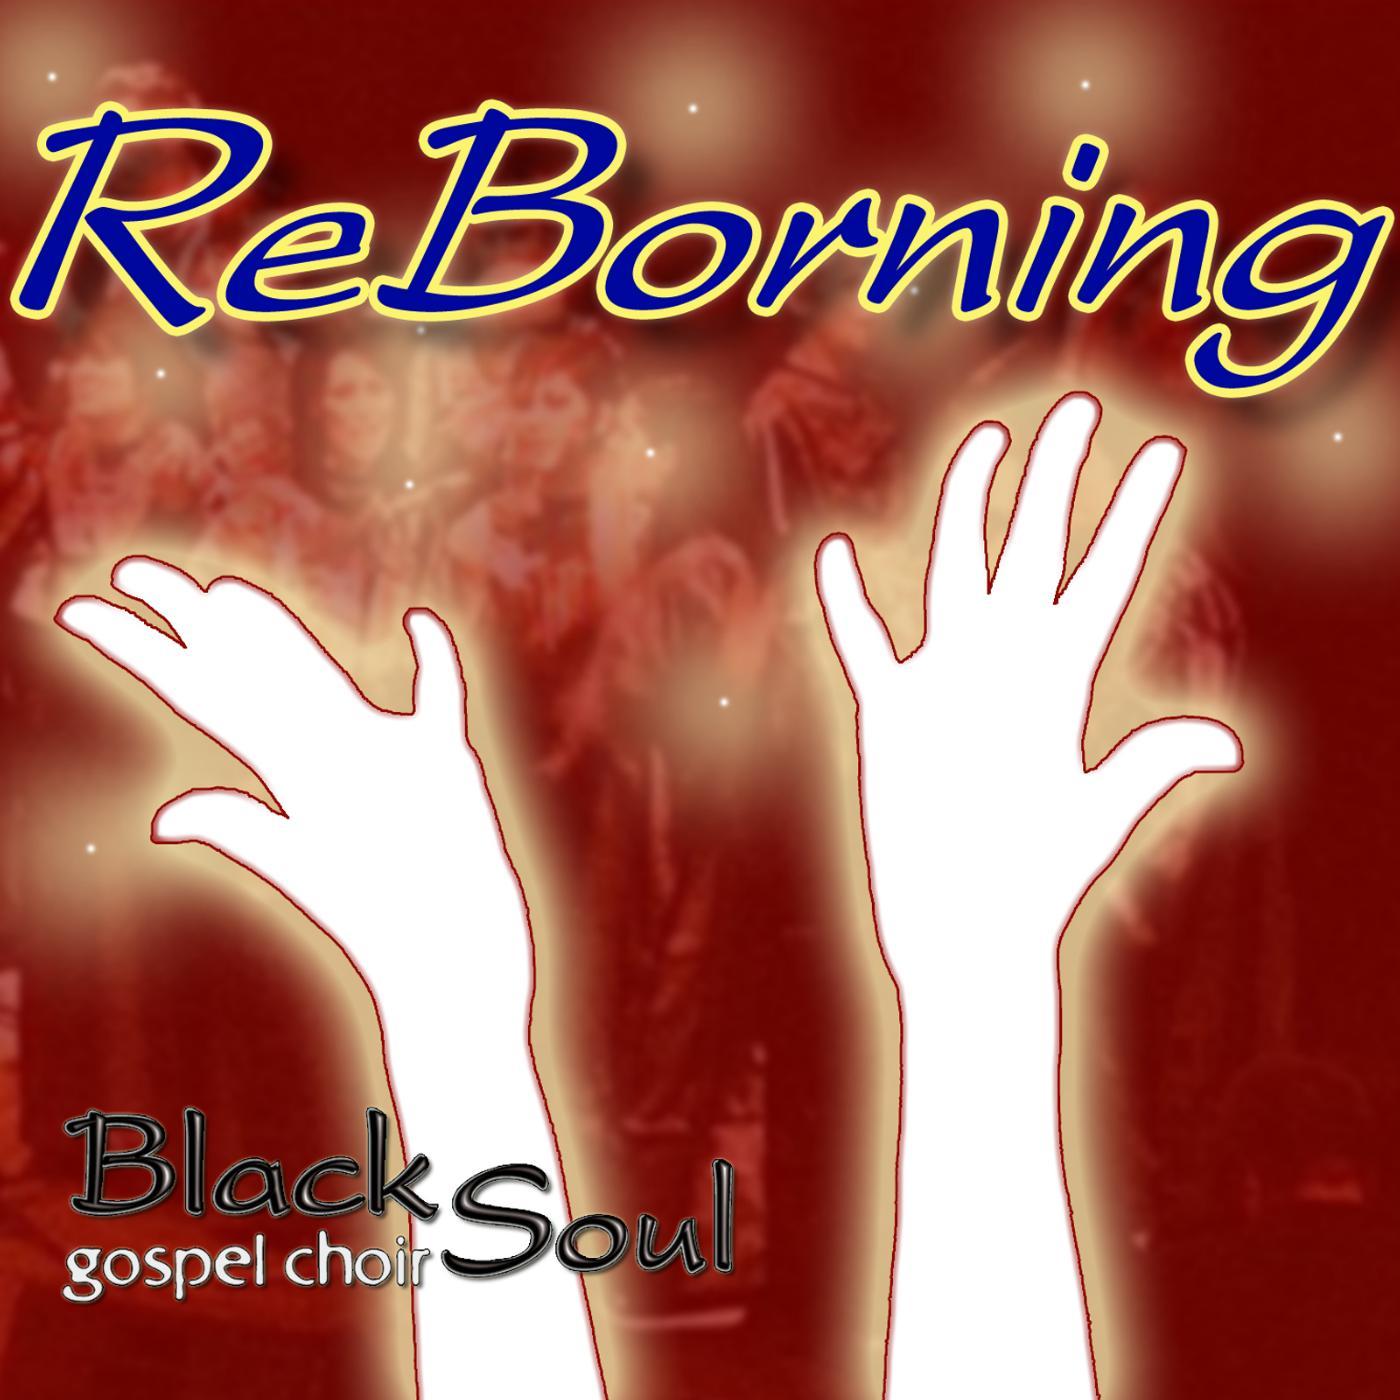 Black Soul Gospel Choir Radio: Listen to Free Music & Get